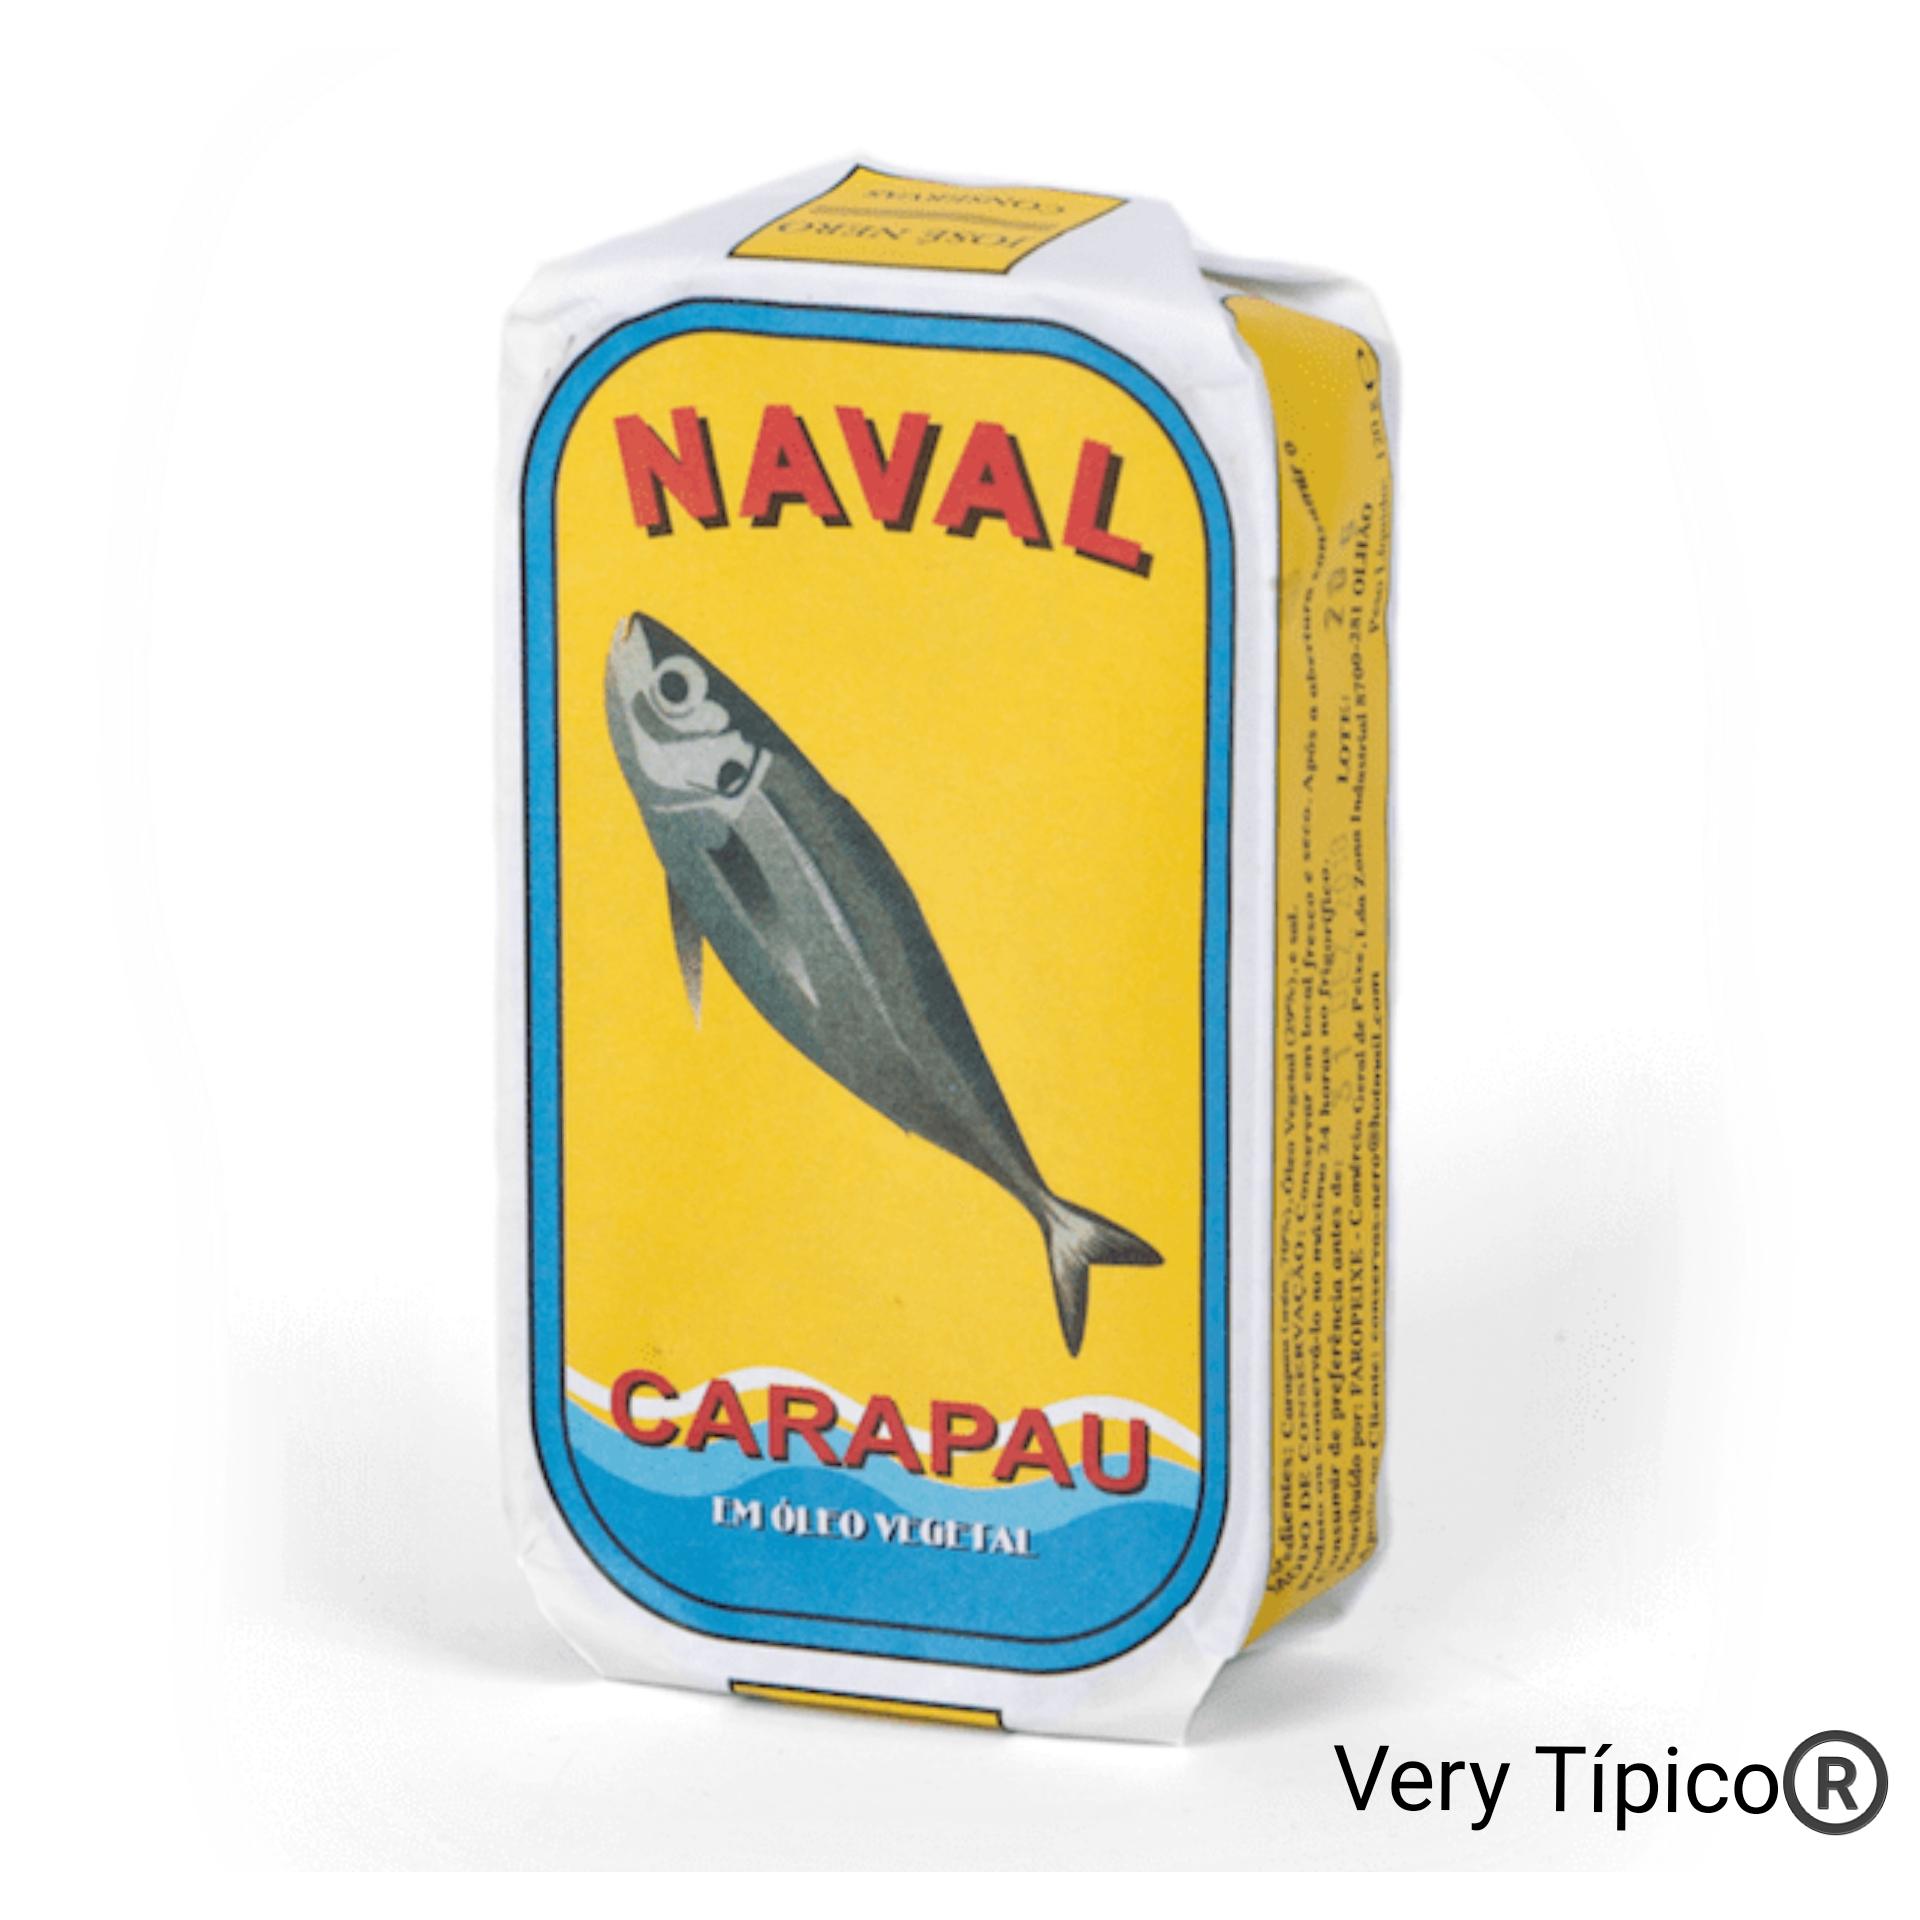 Carapau em Óleo Vegetal - Horse mackerel in vegetable oil